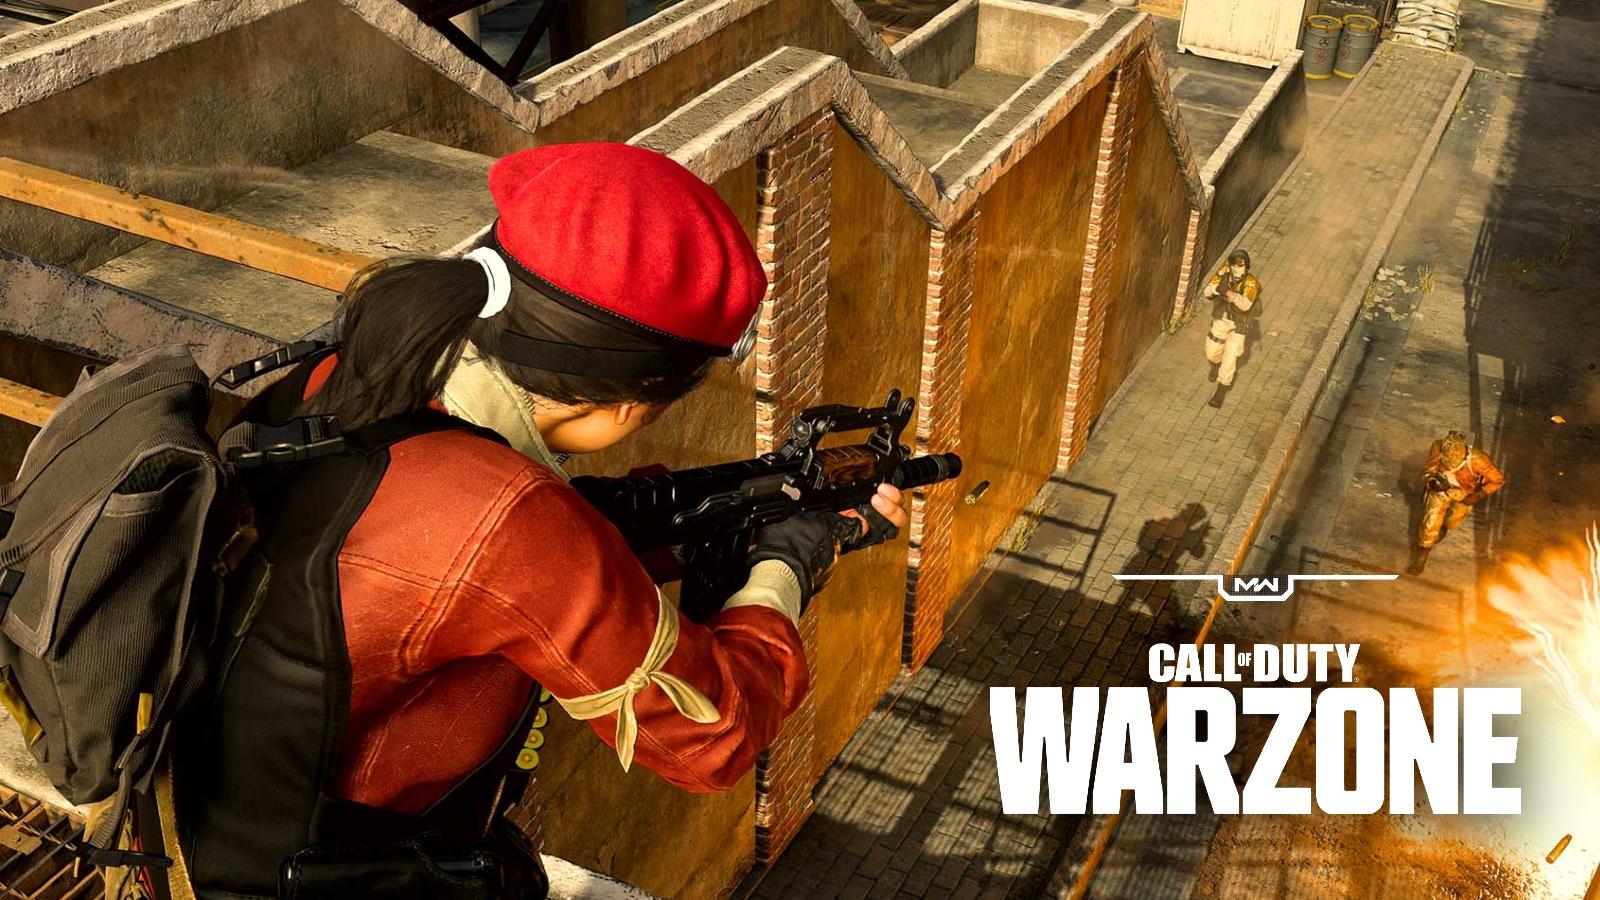 Warzone gunfight anti-cheat